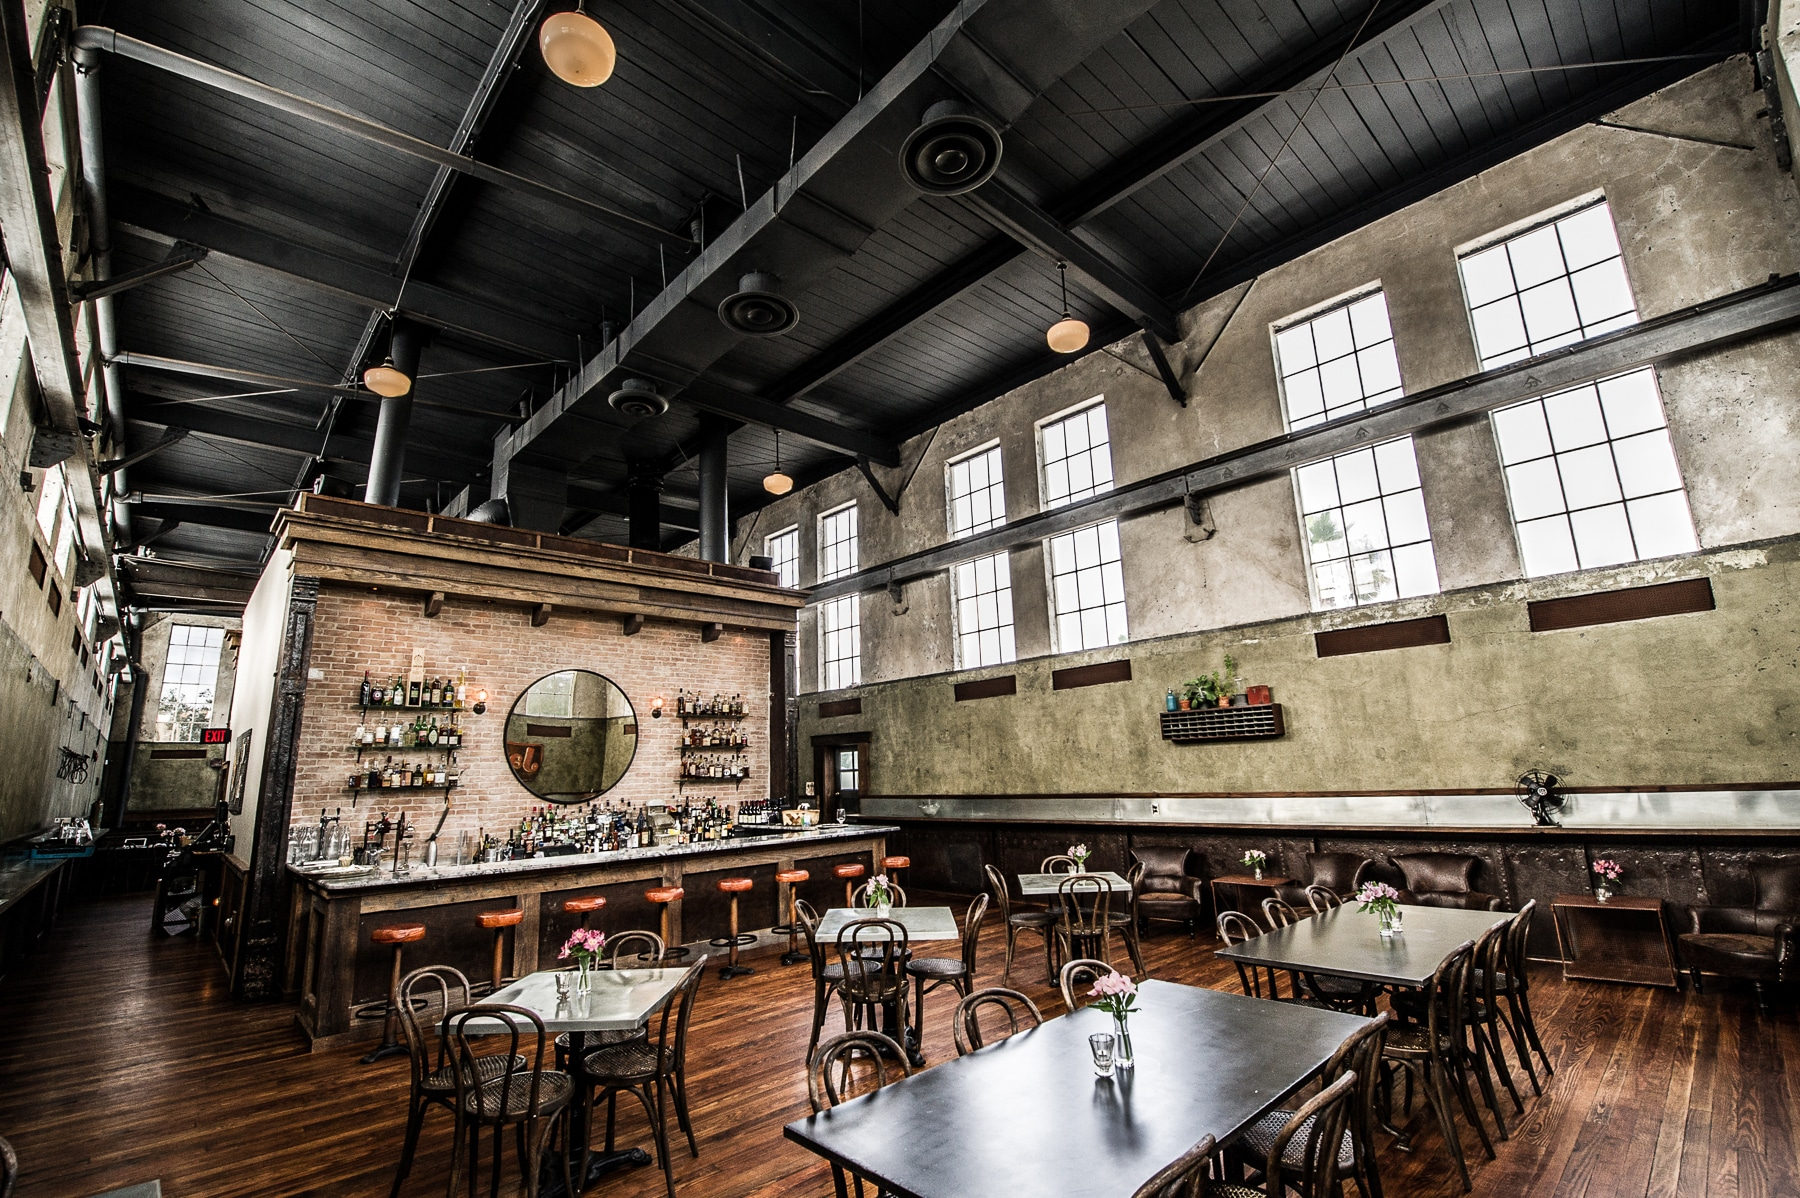 America S Best Restaurants In Historical Buildings